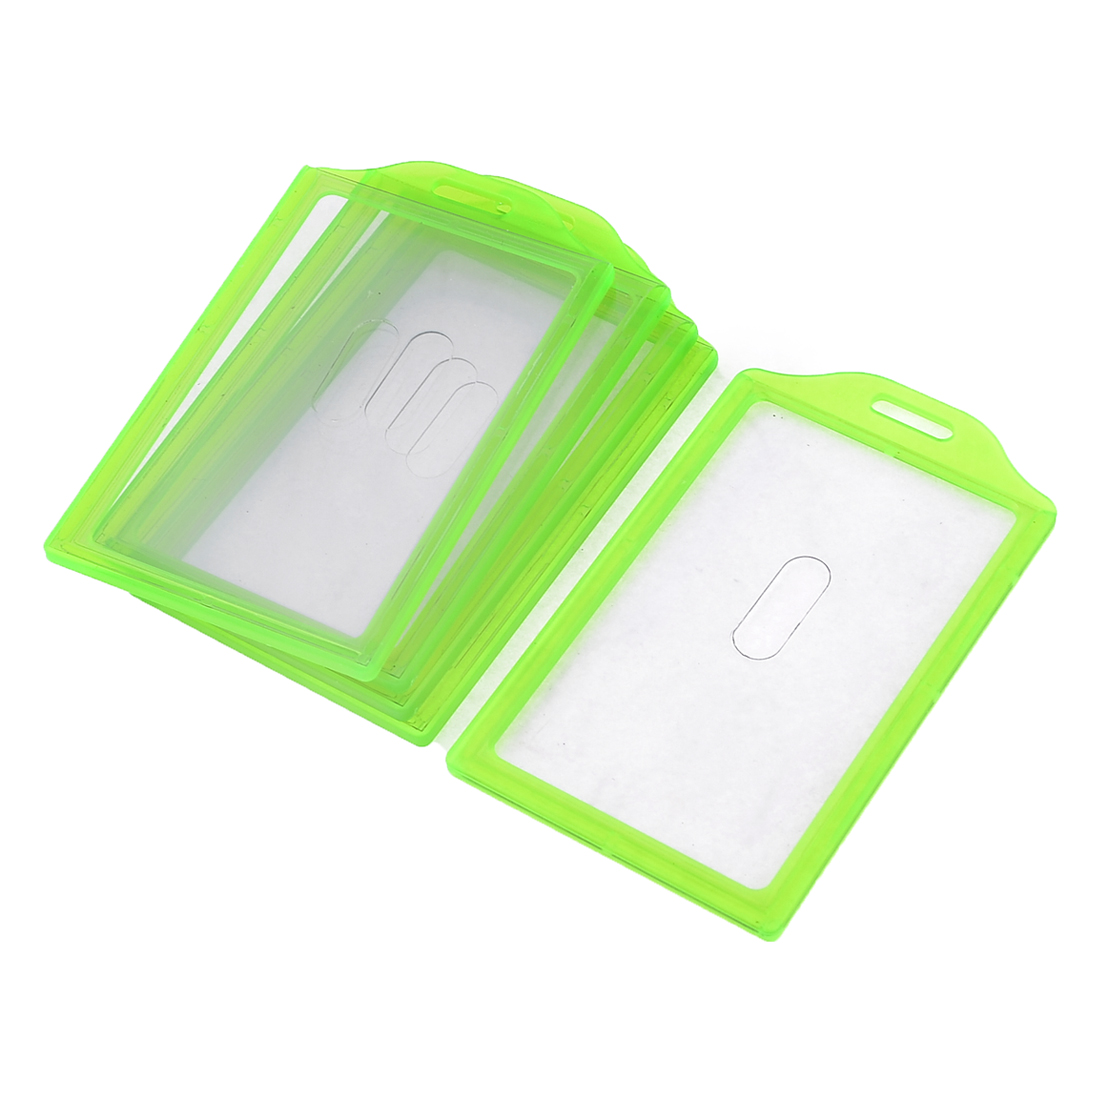 5pcs Green Plastic Frame Vertical School Slide ID Card Holder 84mm x 52mm